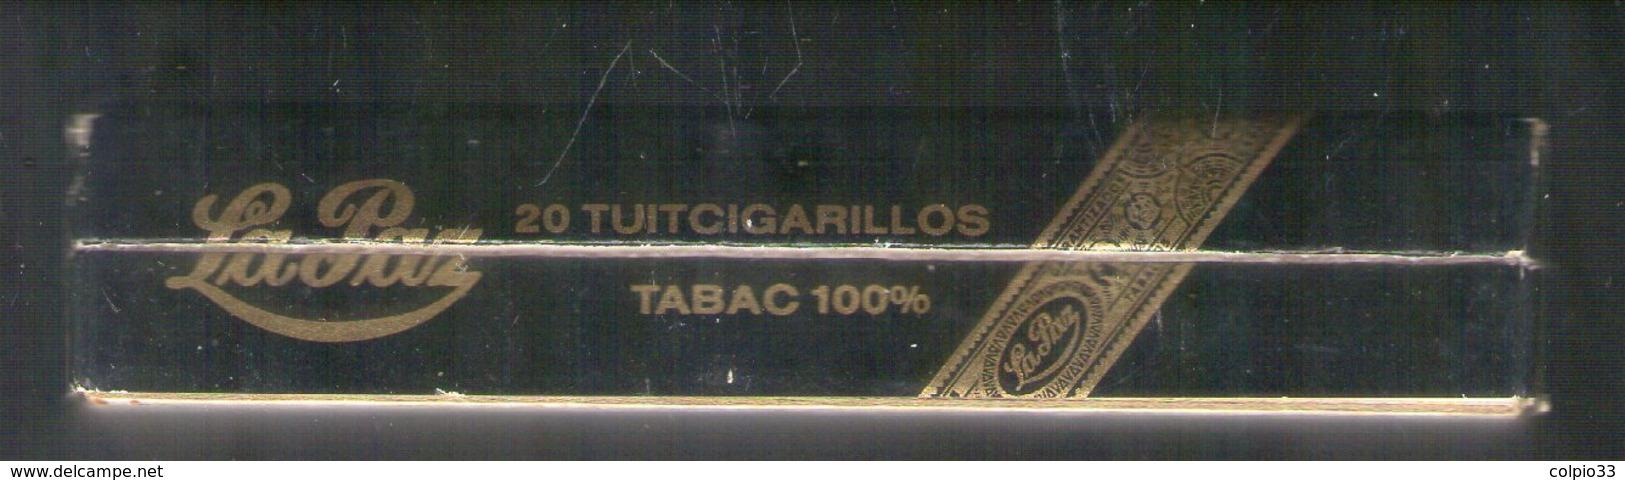 BOITE CARTON DE 20 CIGARES CALDERON . TABACOS  LA PAZ . BOITE DE COLLECTION AVANT LES ANNEES 2000 - Contenitore Di Sigari